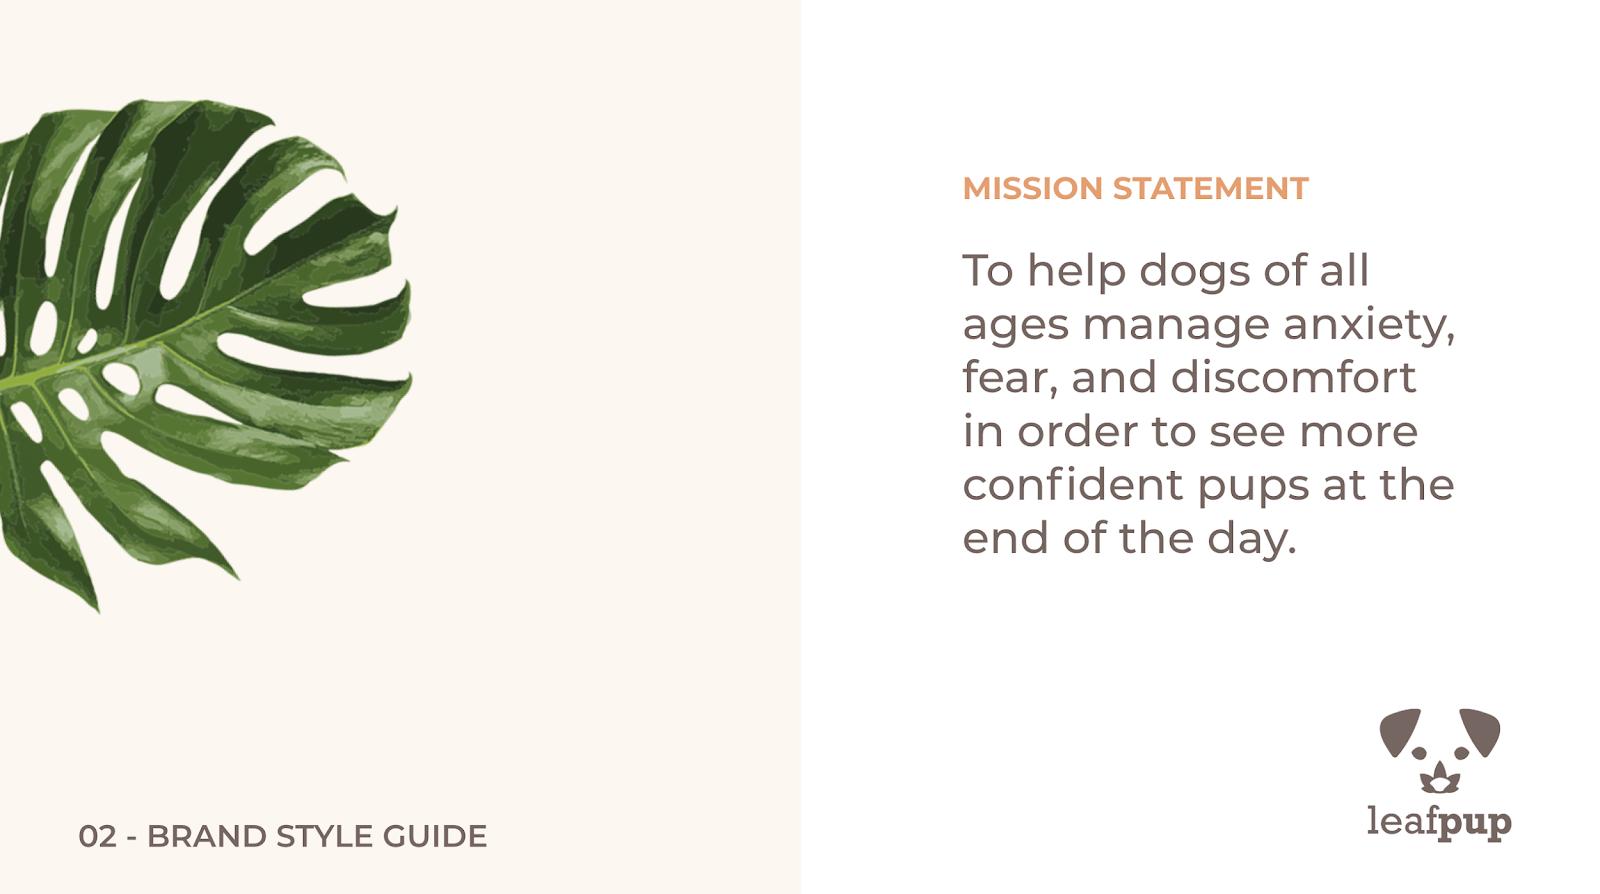 Leafpup's Mission Statement